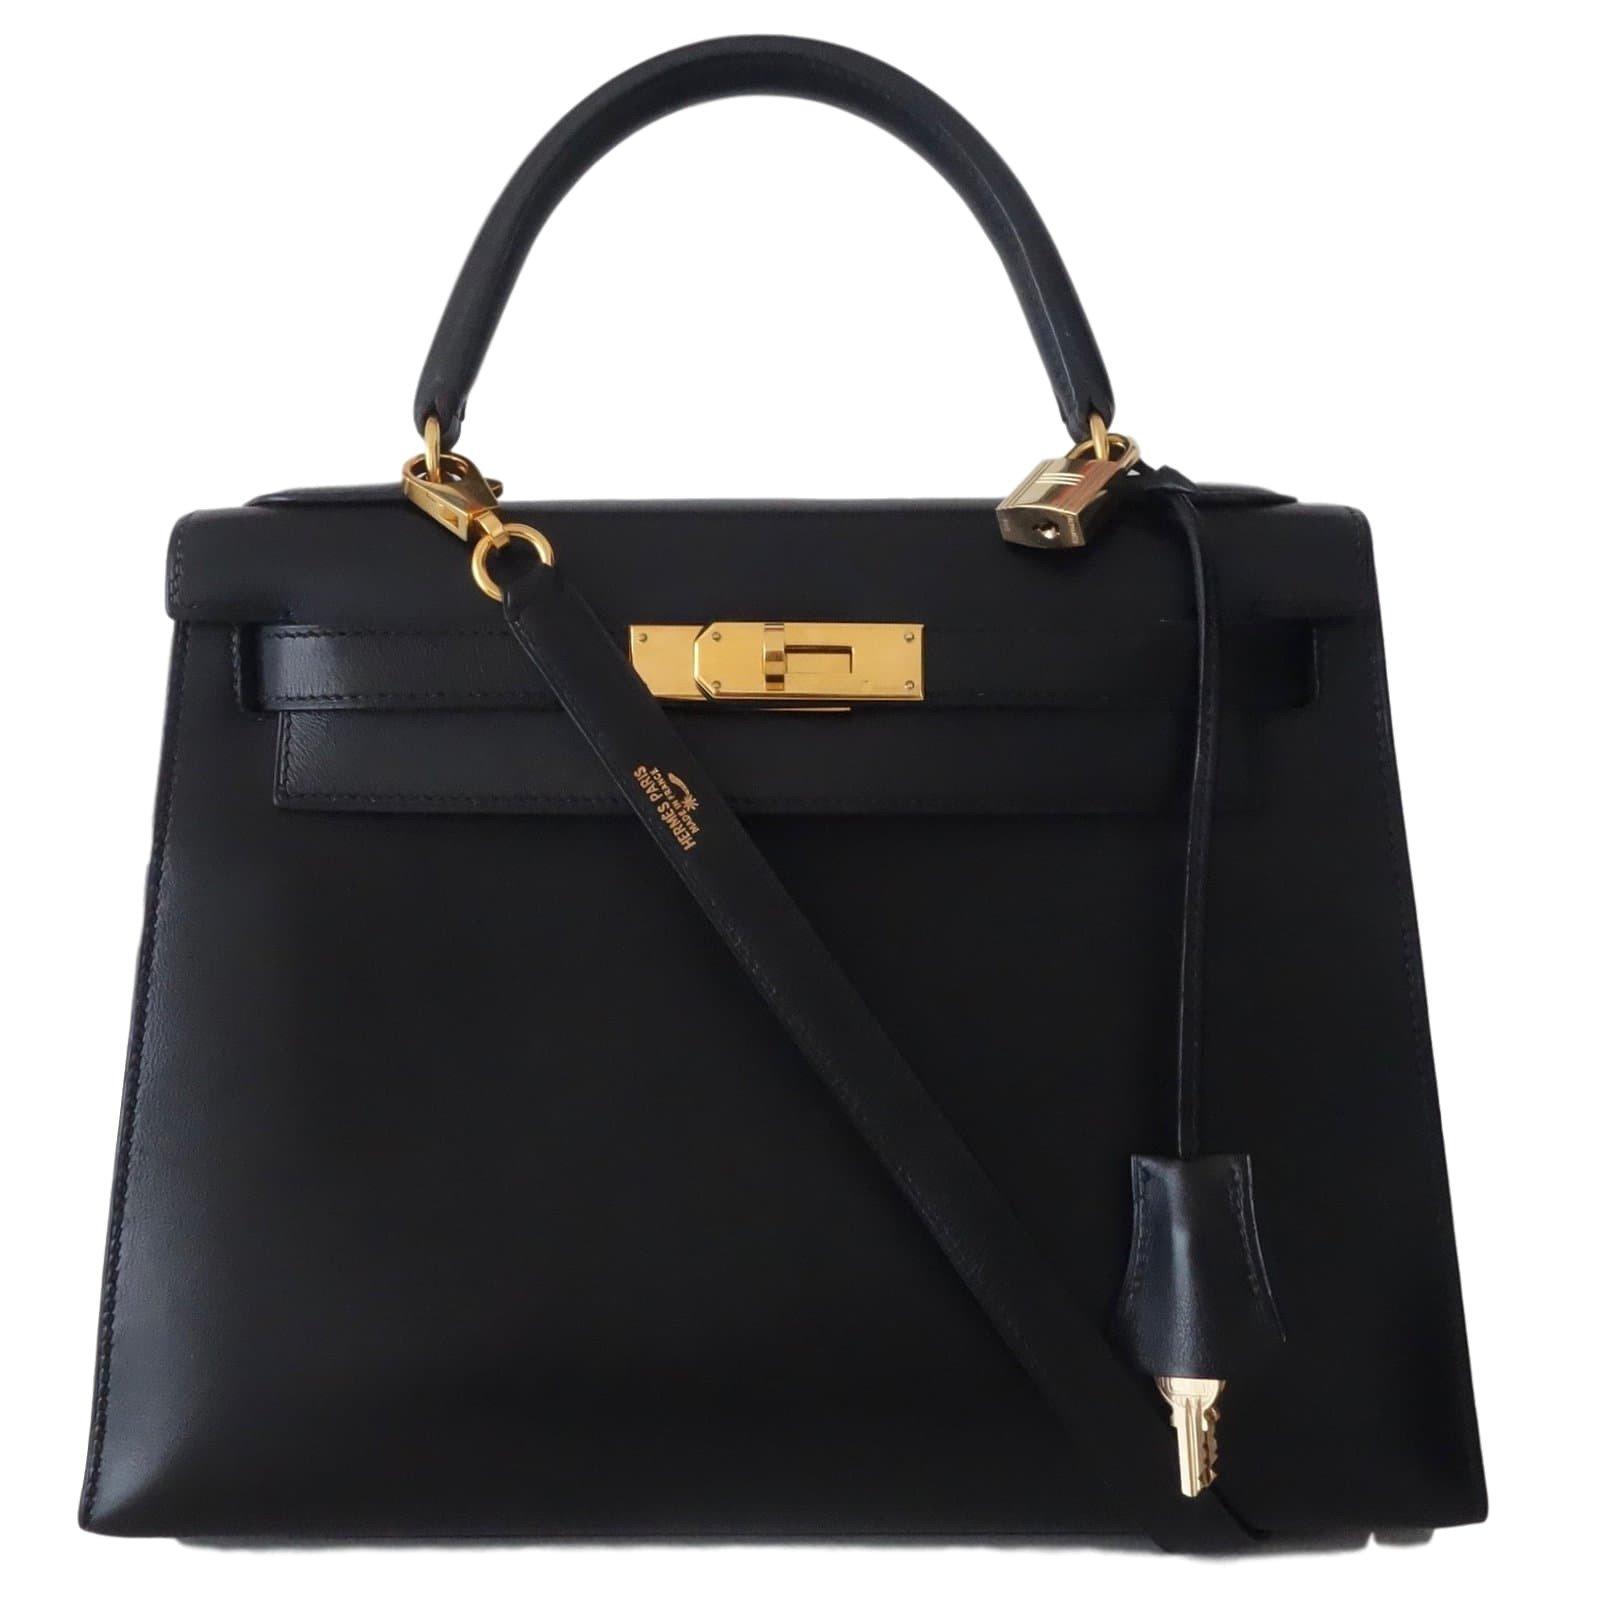 a9c794814b Sacs à main Hermès SAC HERMES KELLY 28 NOIR Cuir Noir ref.43543 ...